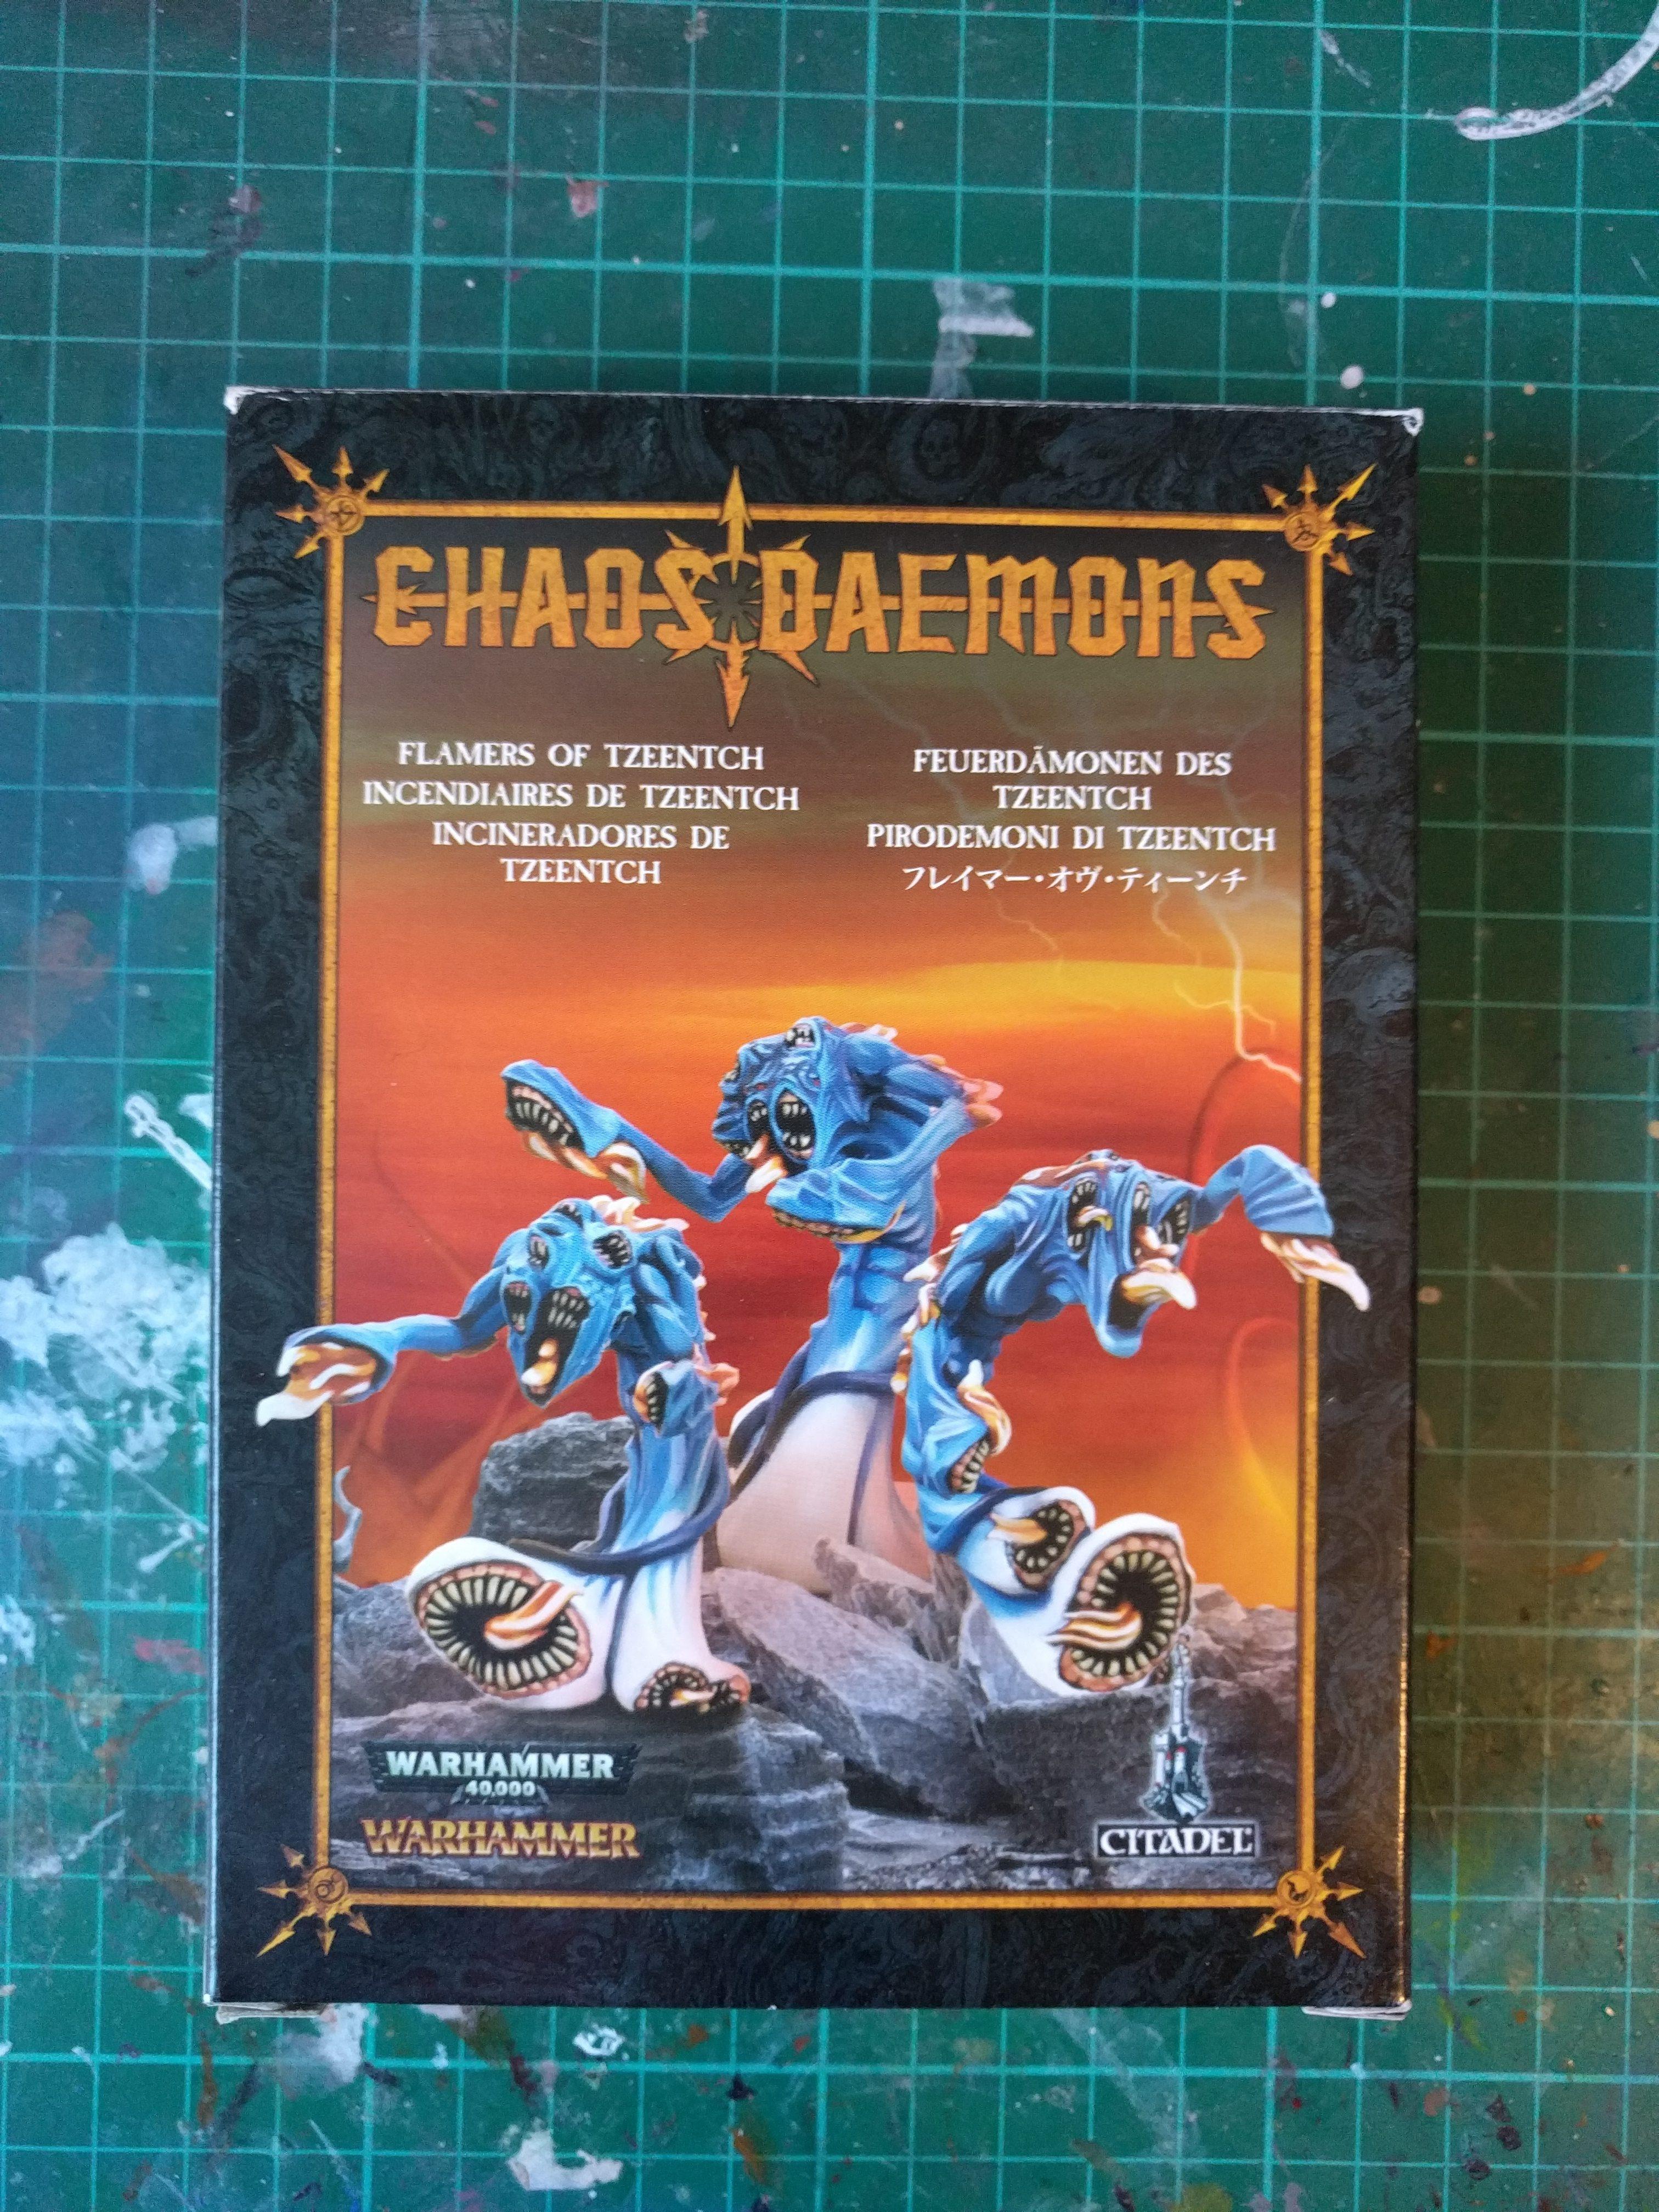 Chaos Daemons Flamers of Tzeentch Metal